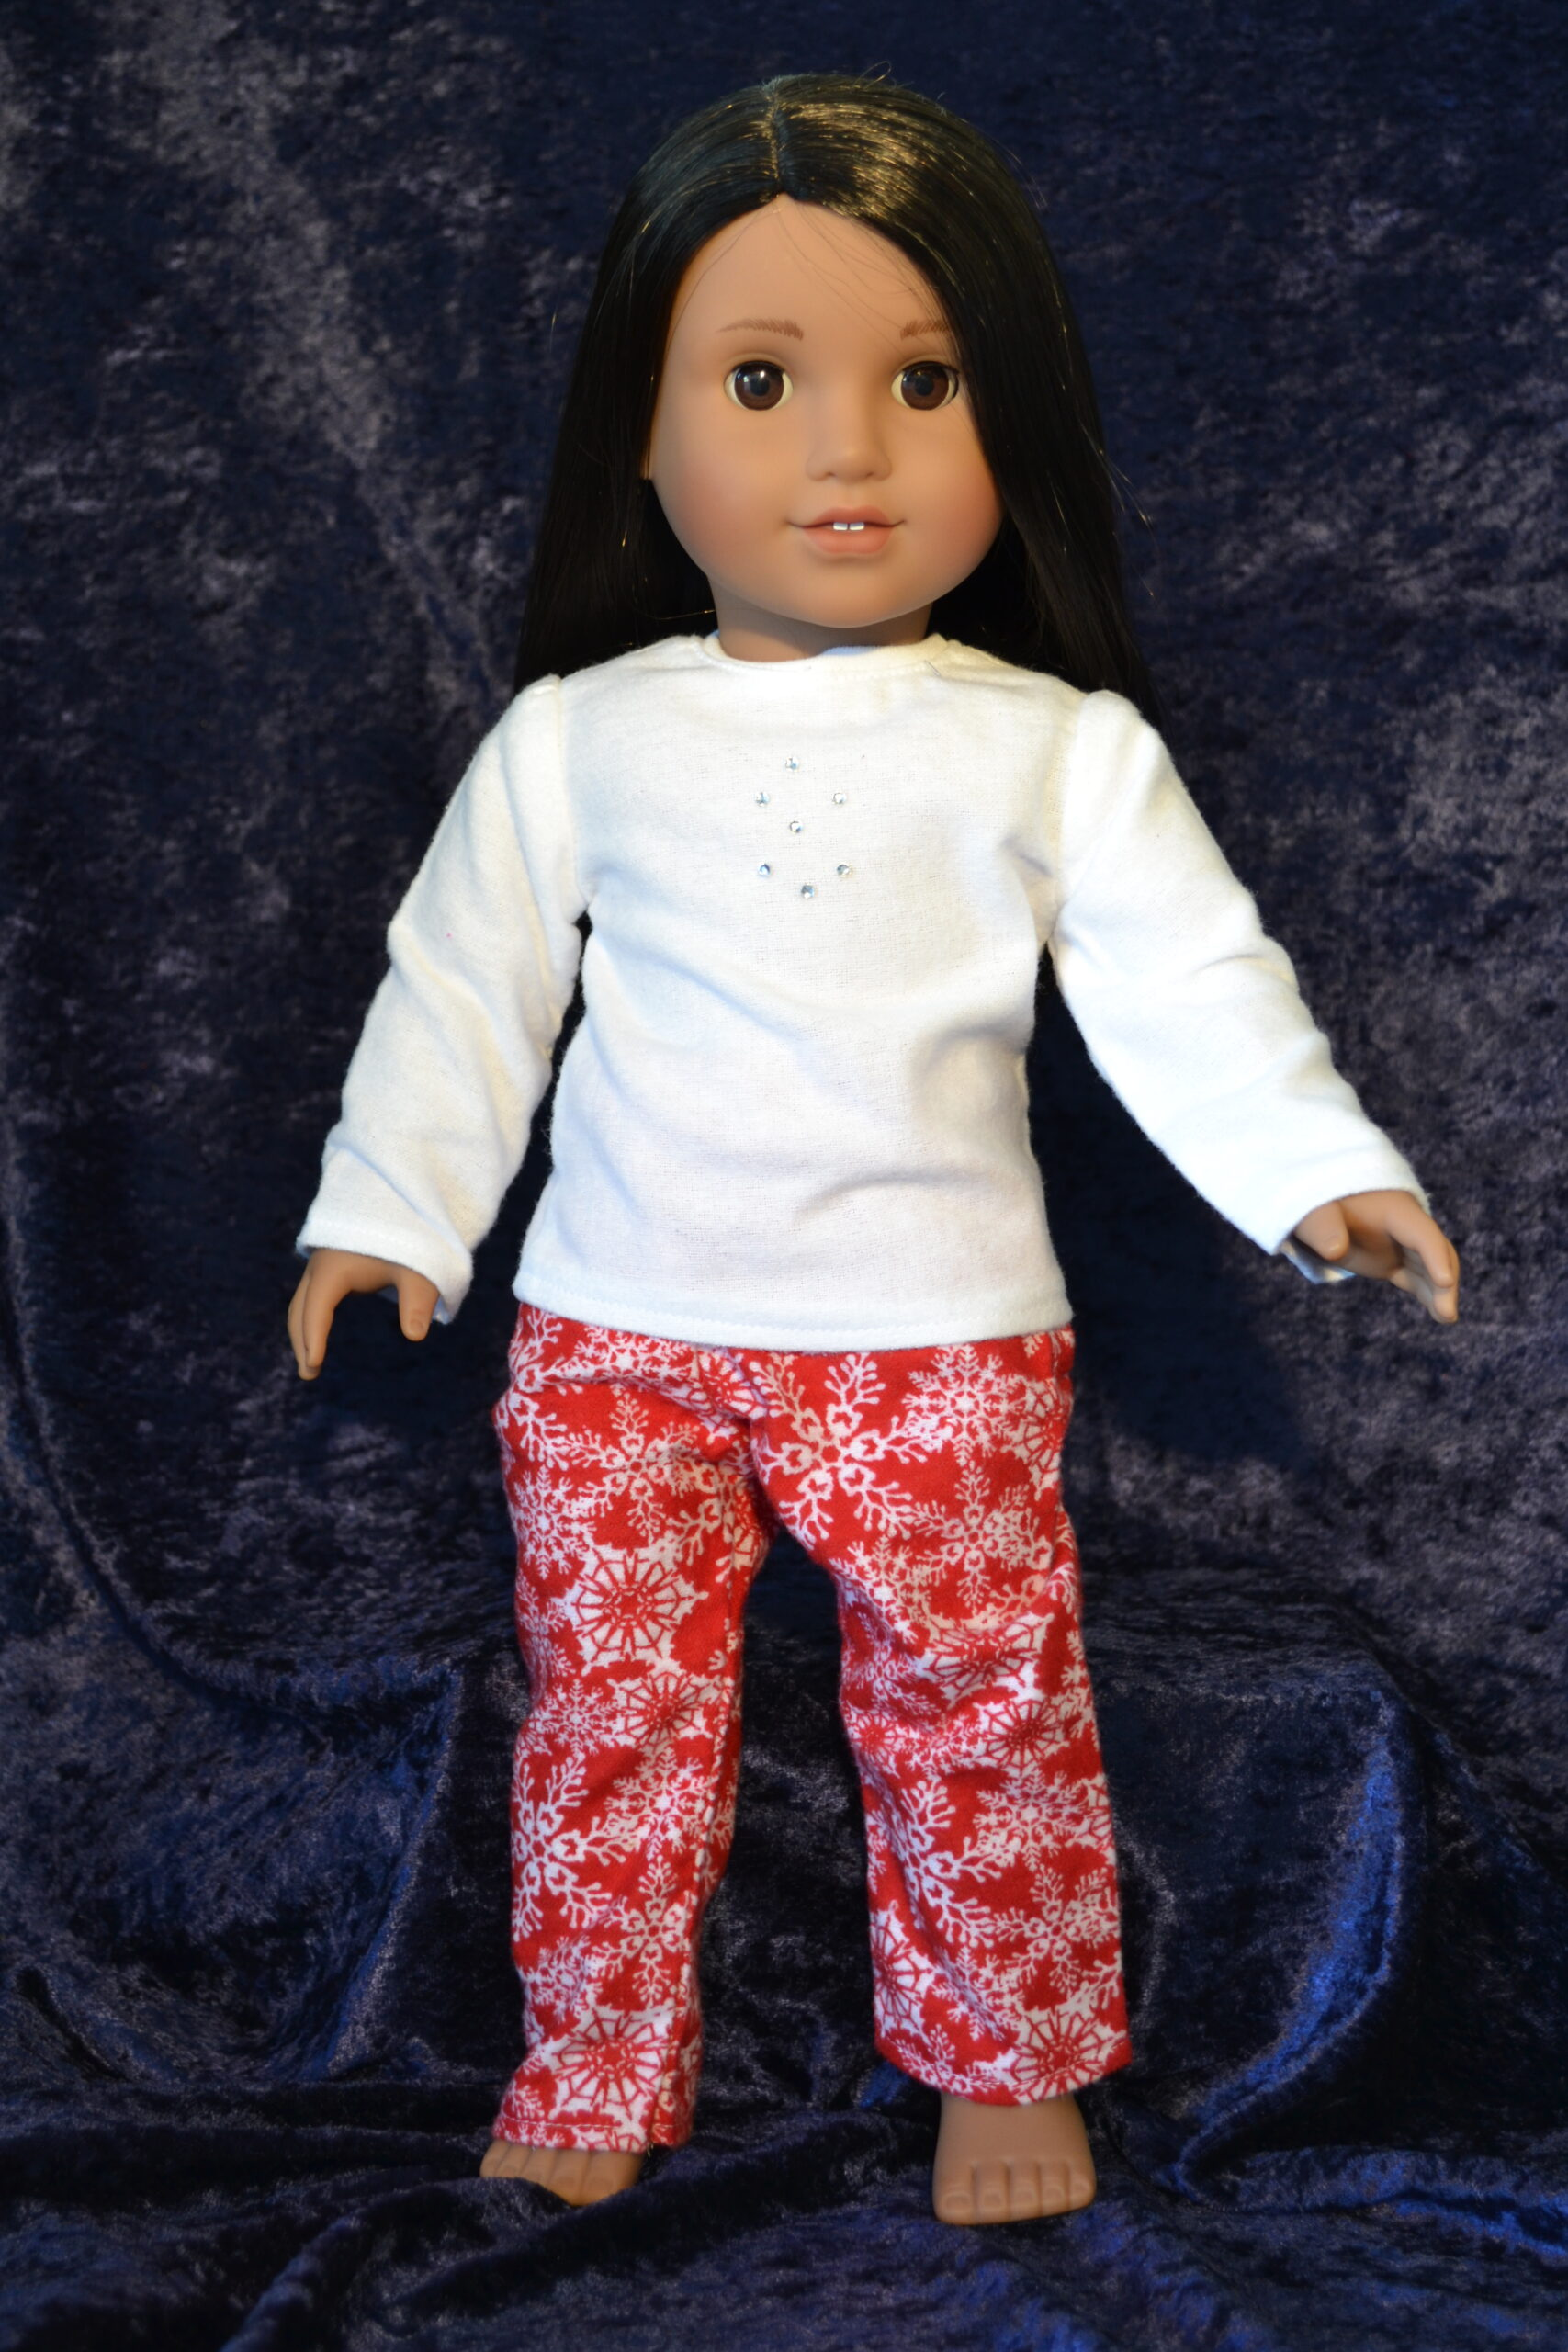 Red Snowflake Print PJ set for 18 Inch Dolls